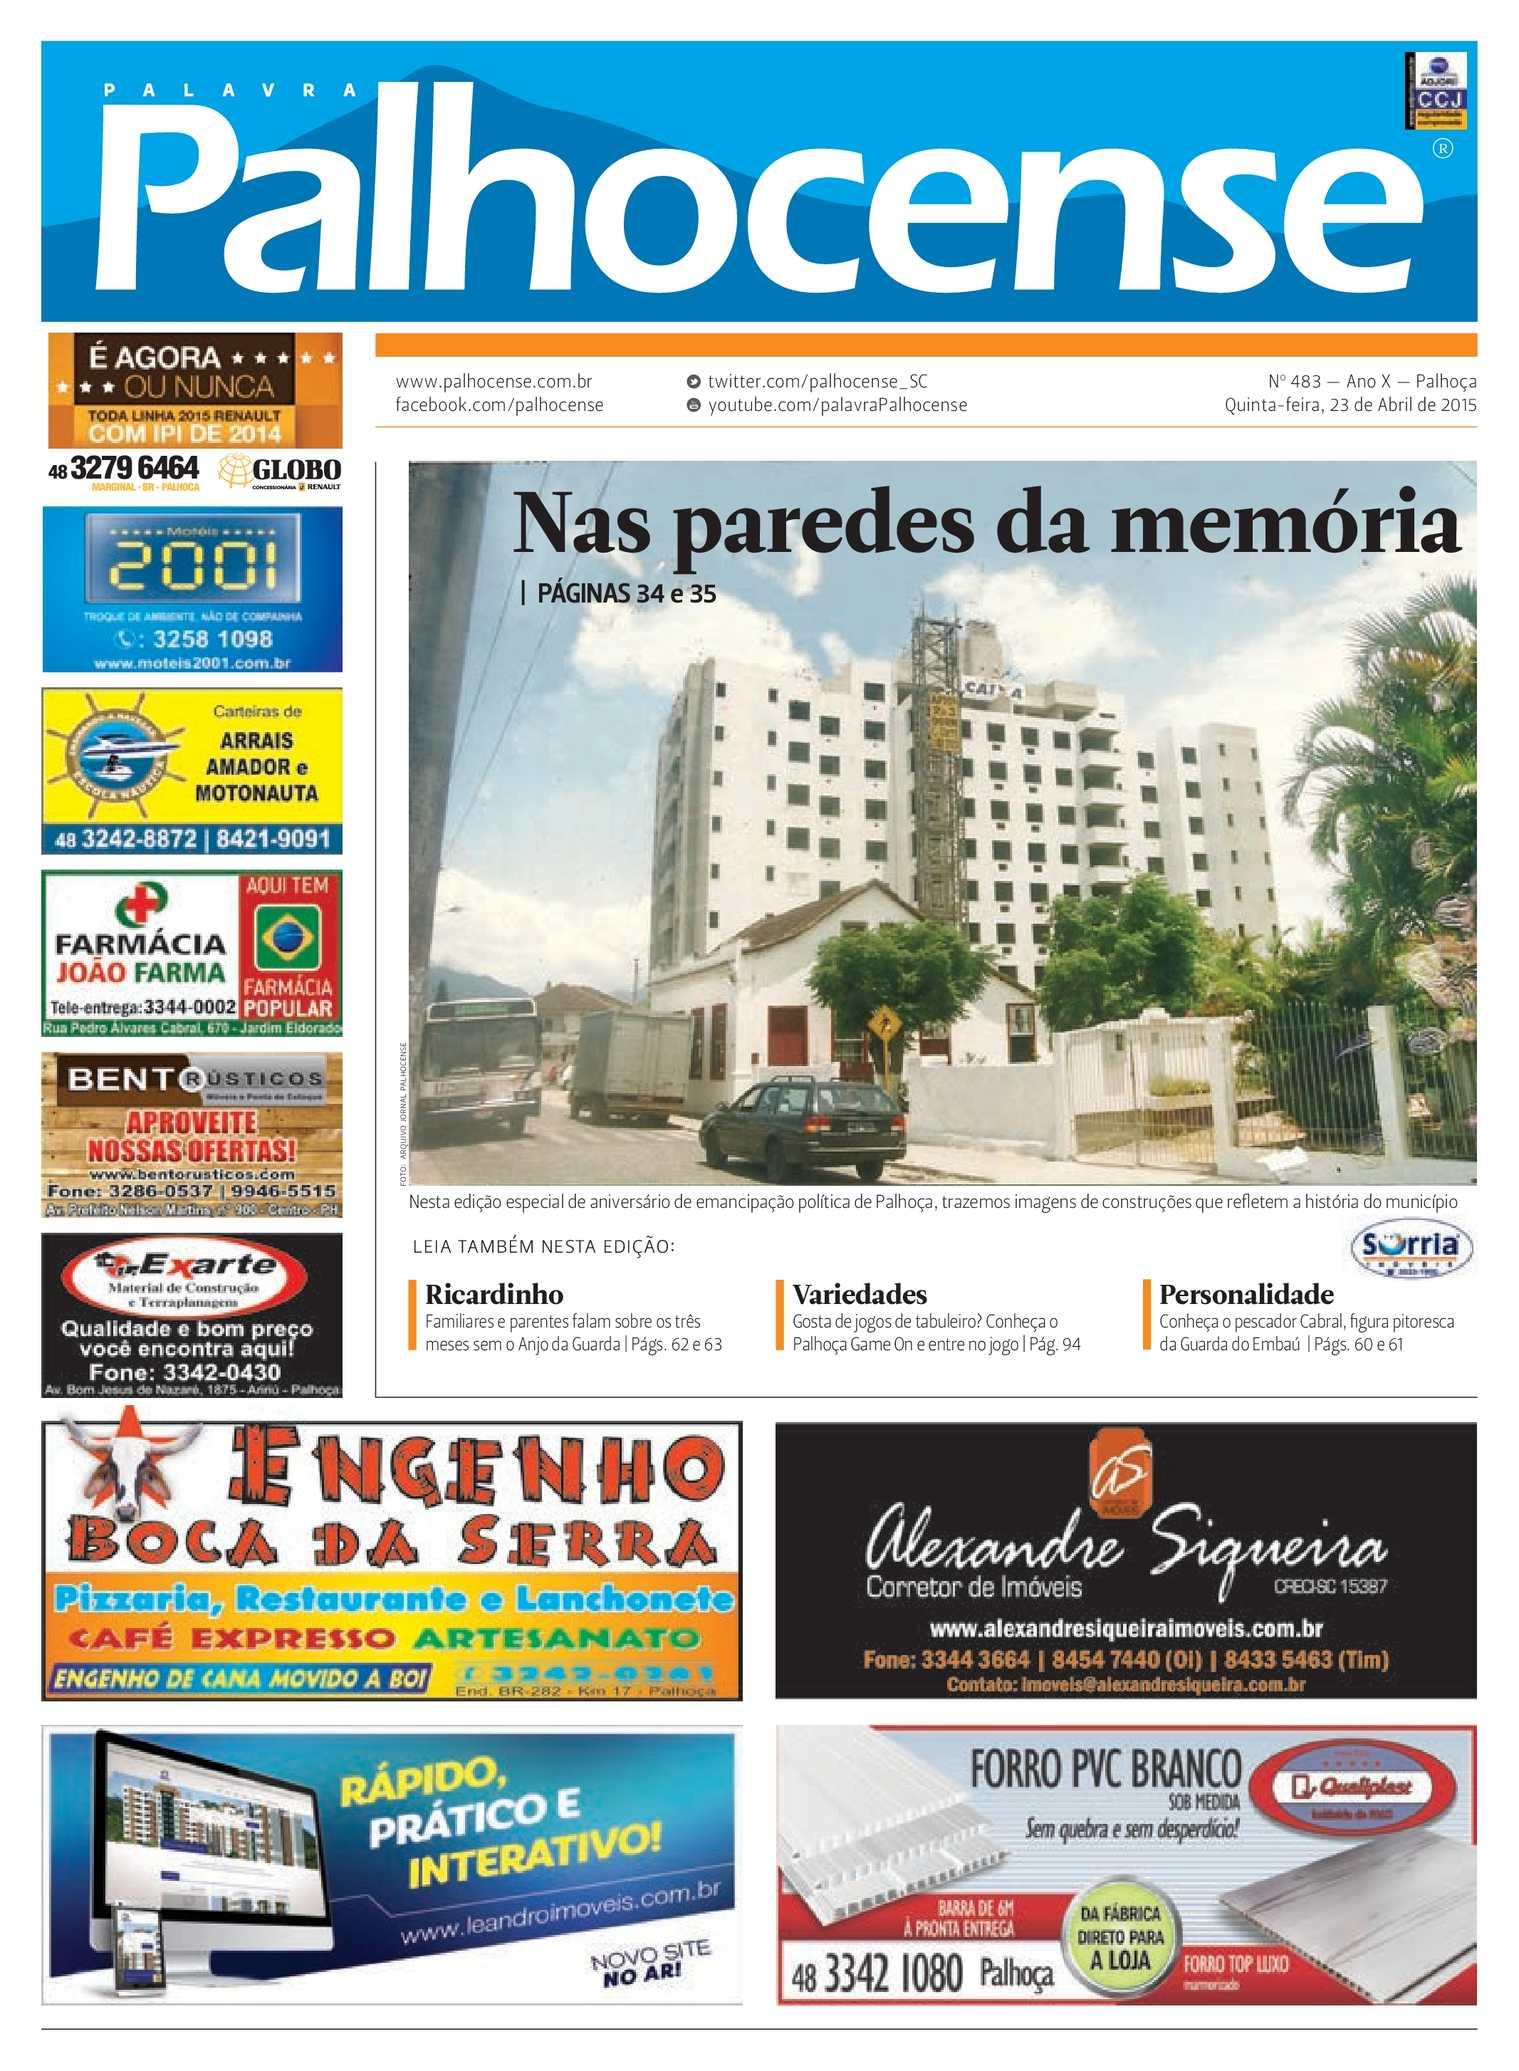 b21c84dde Calaméo - Jornal Palavra Palhocense - Edição 483